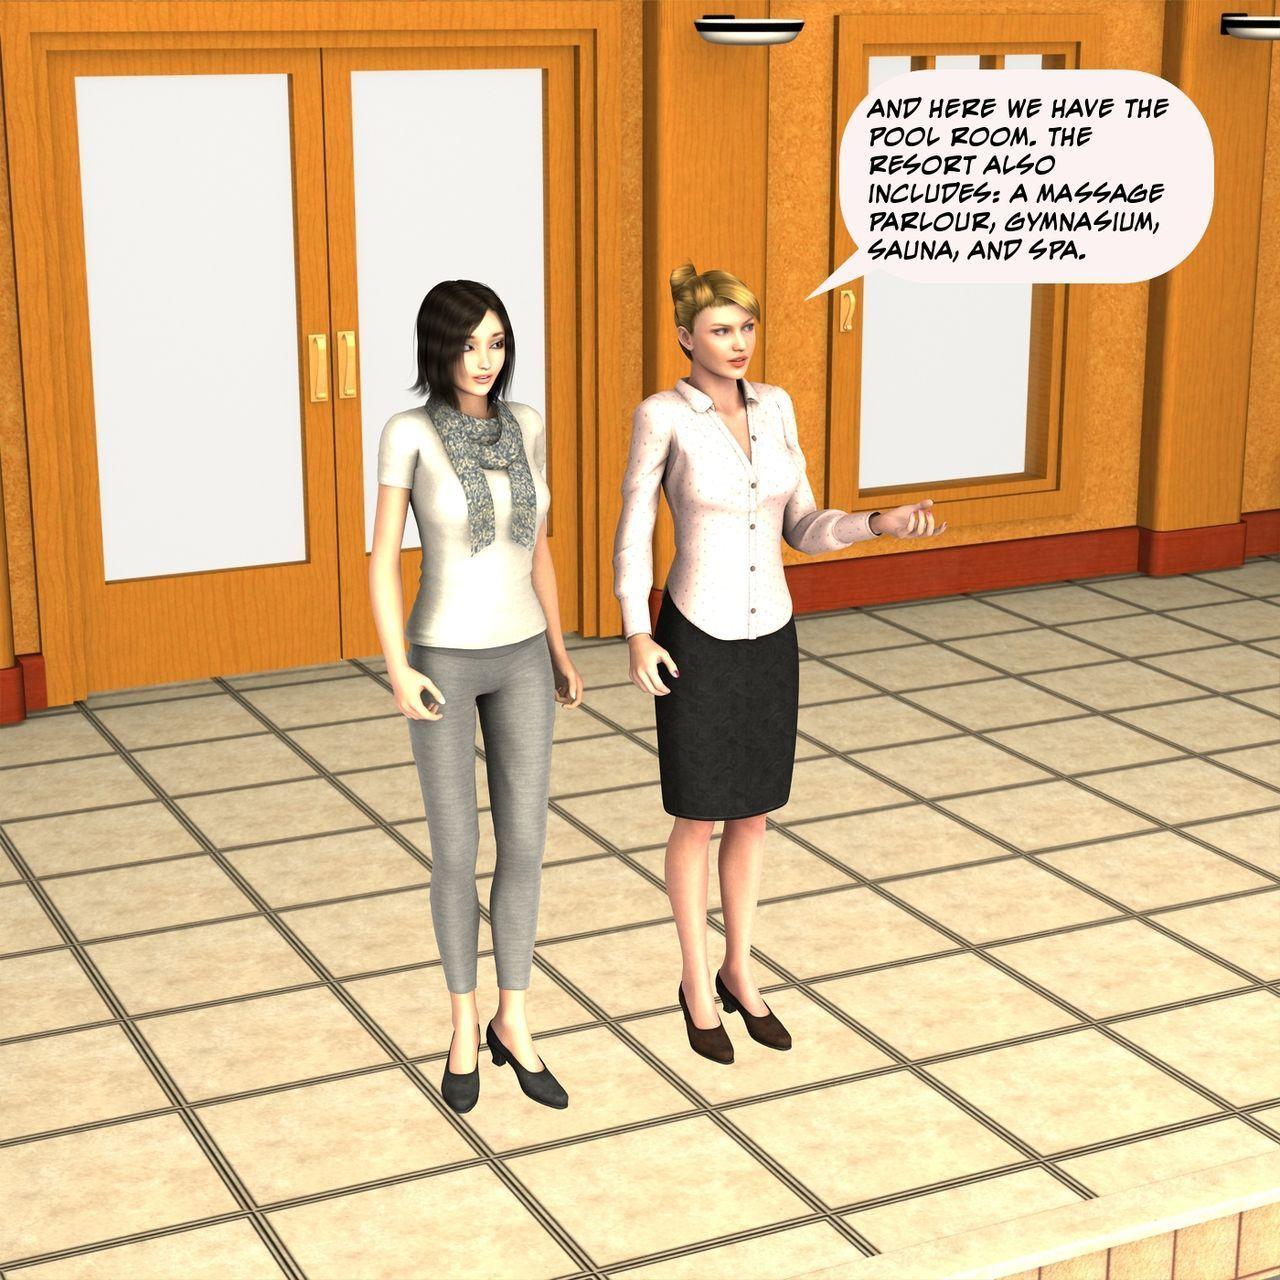 [Fasdeviant] Ashbury Private Health Resort - Chapter 1 - part 2